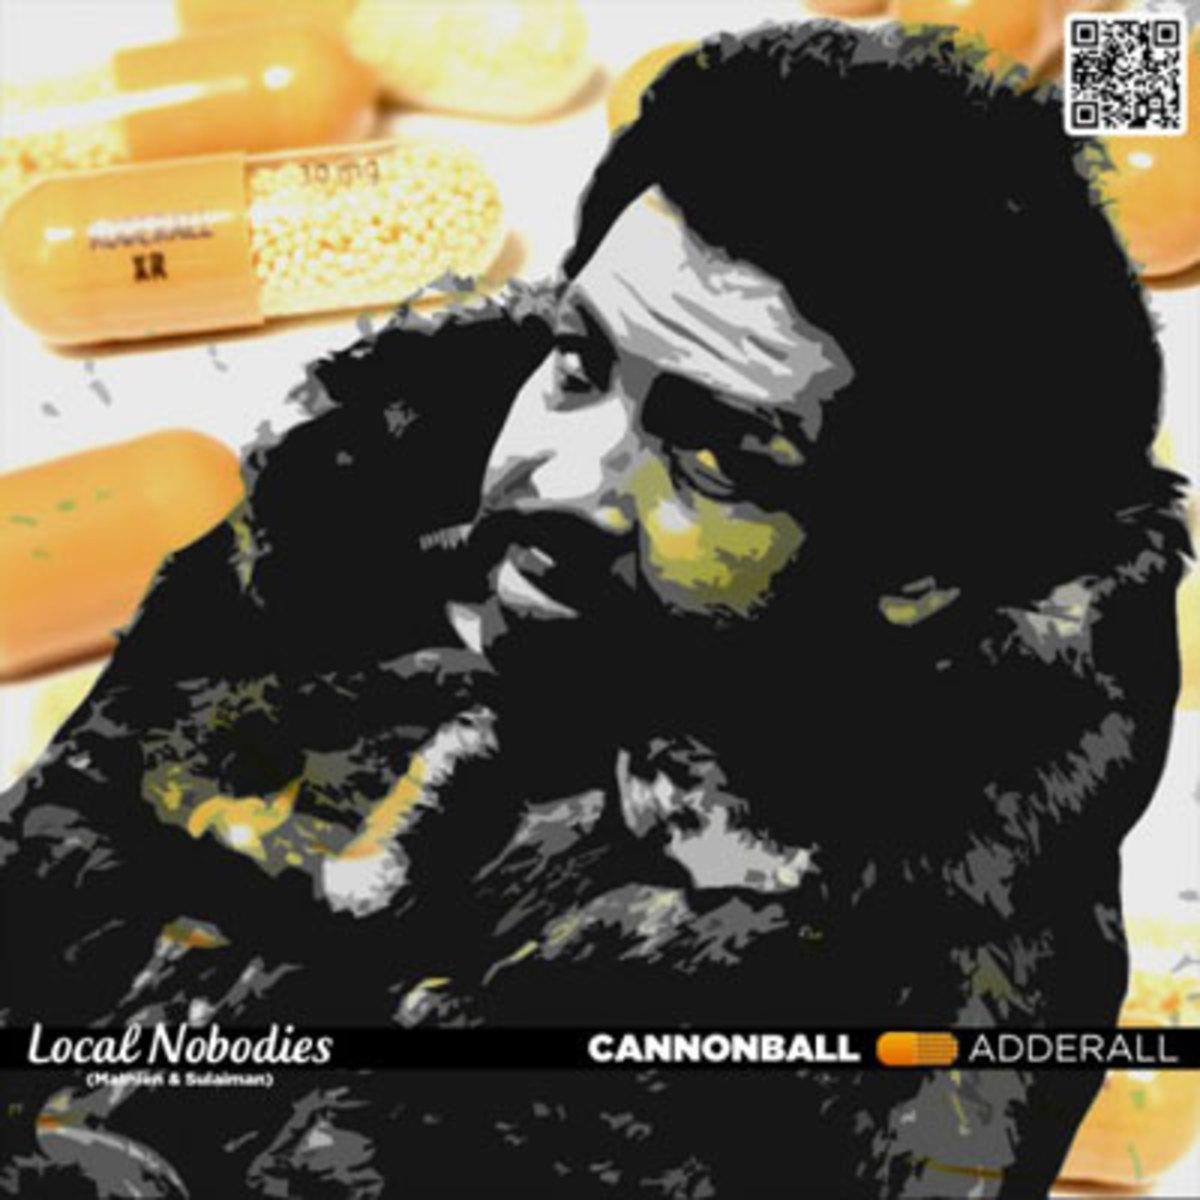 localnobodies-cannonball.jpg